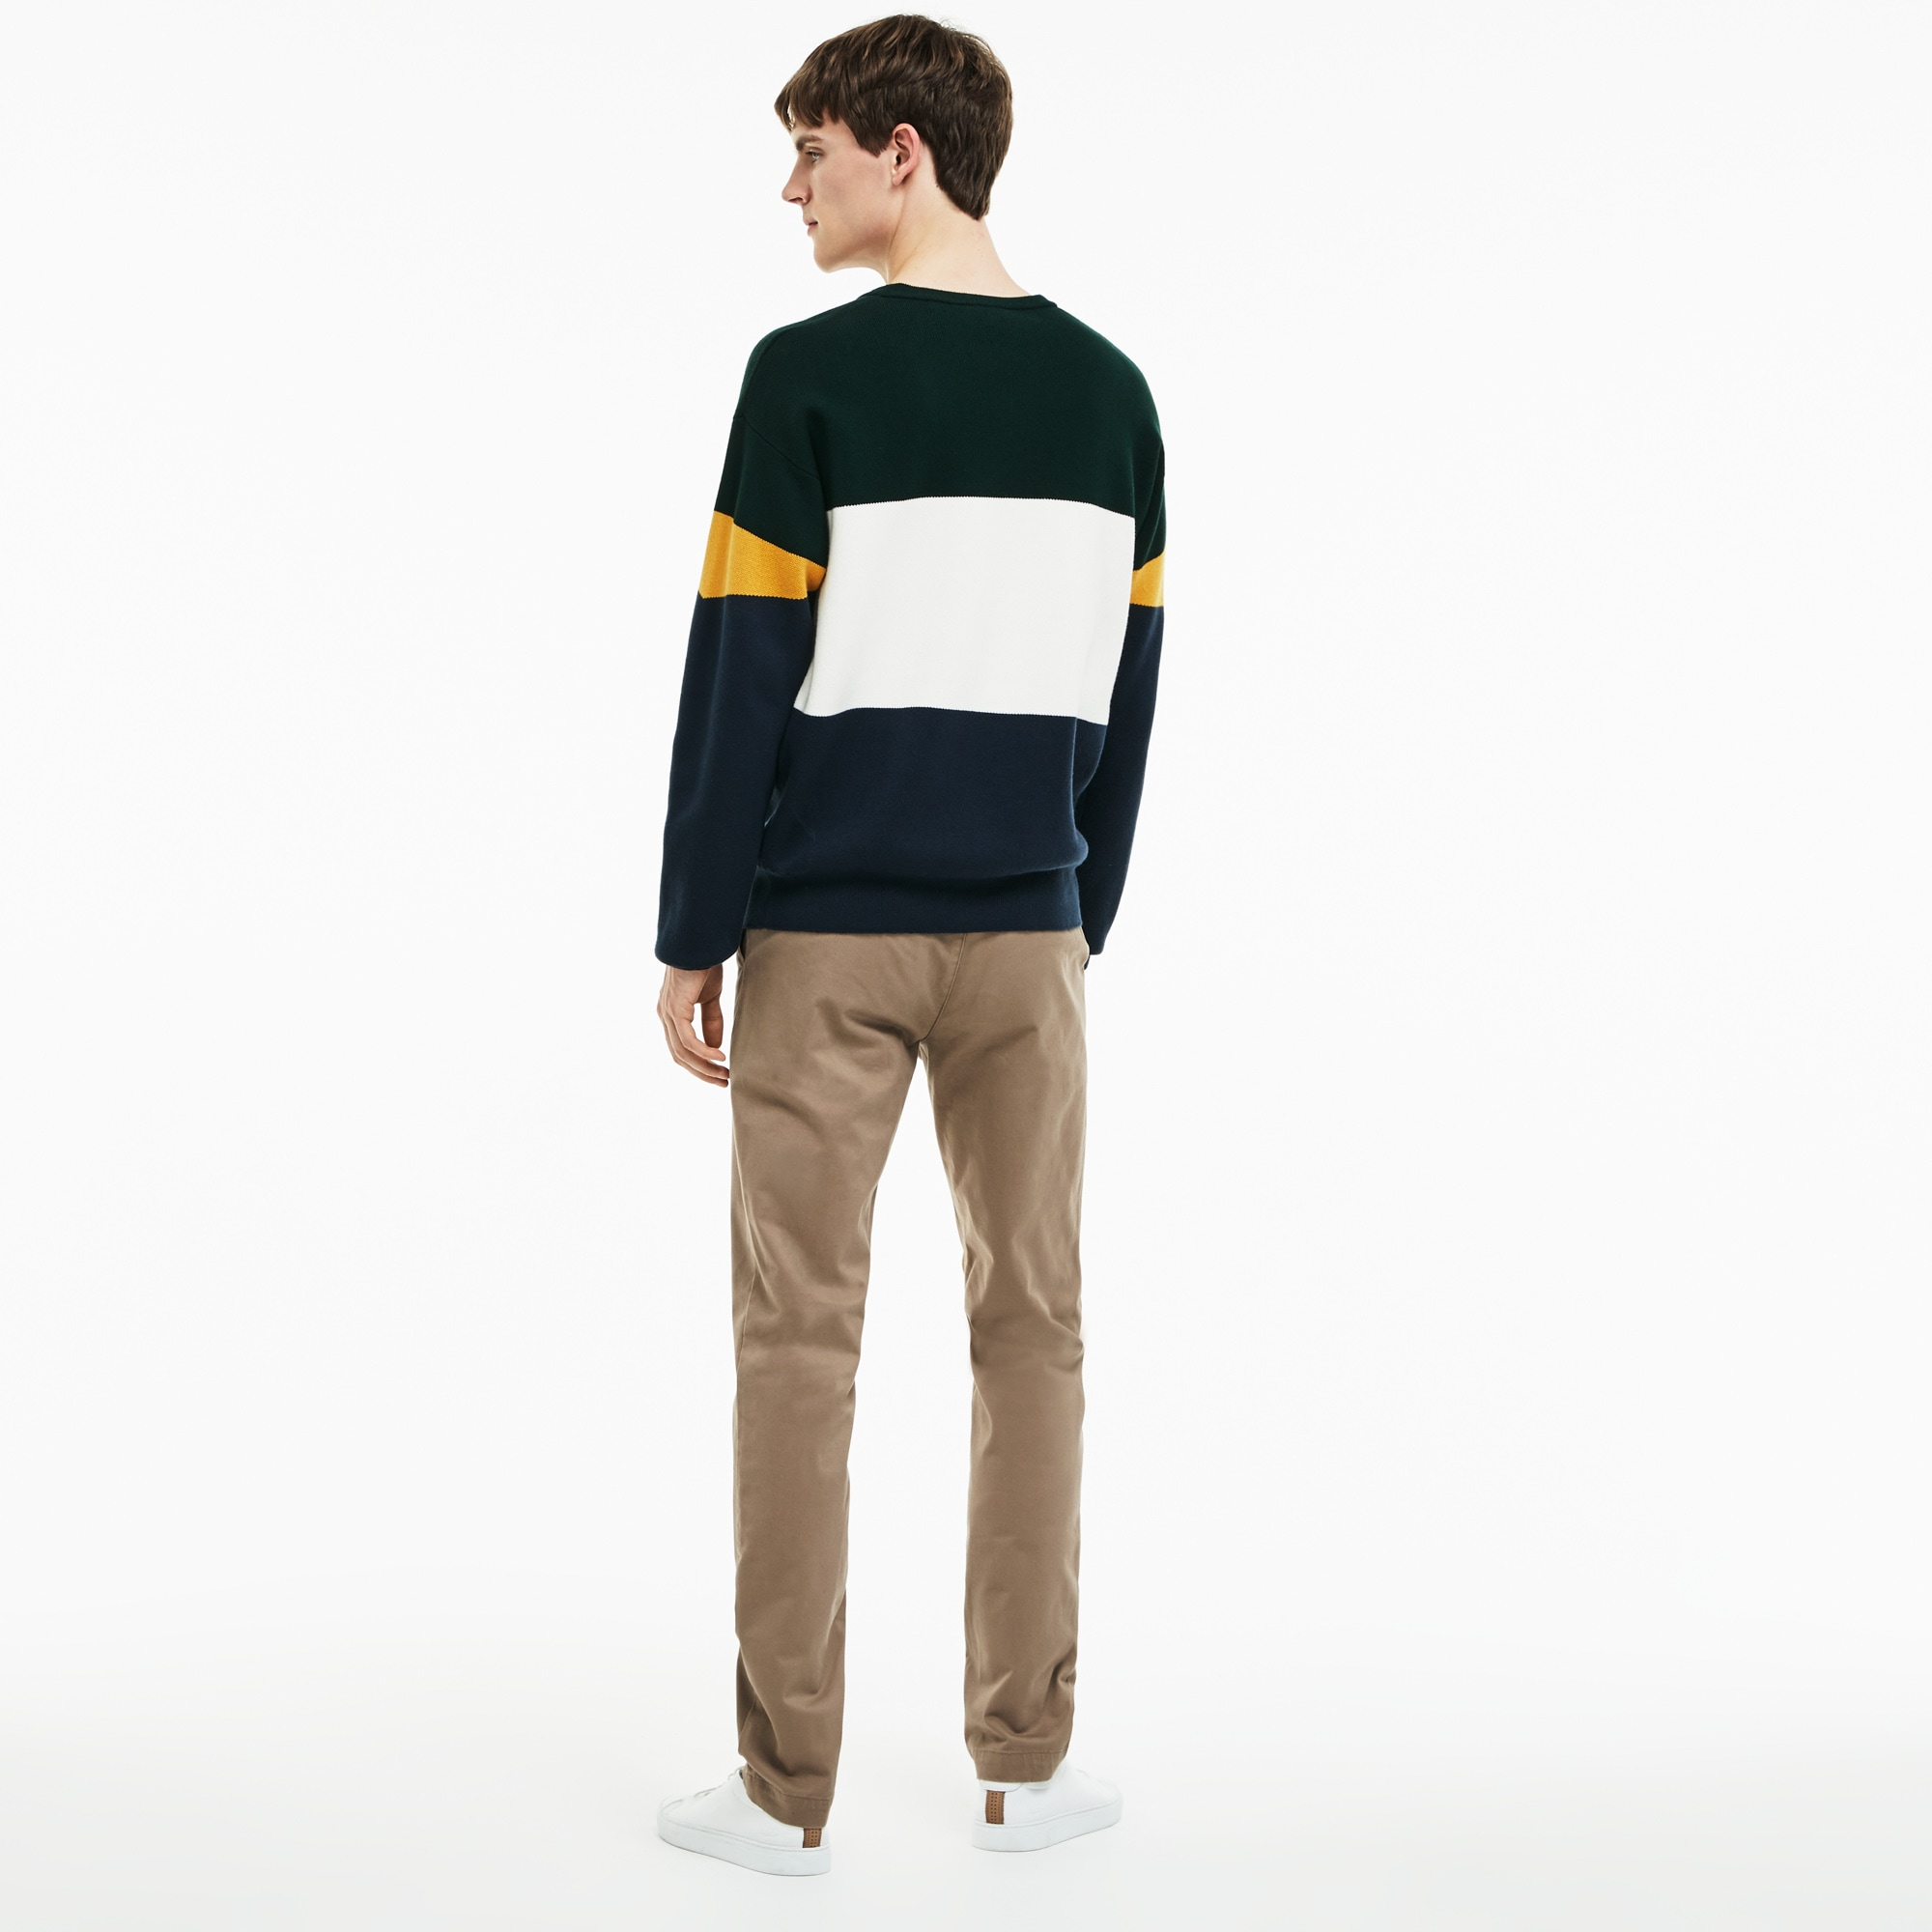 784ffc2d09 Pantalon chino slim fit en gabardine stretch unie   LACOSTE